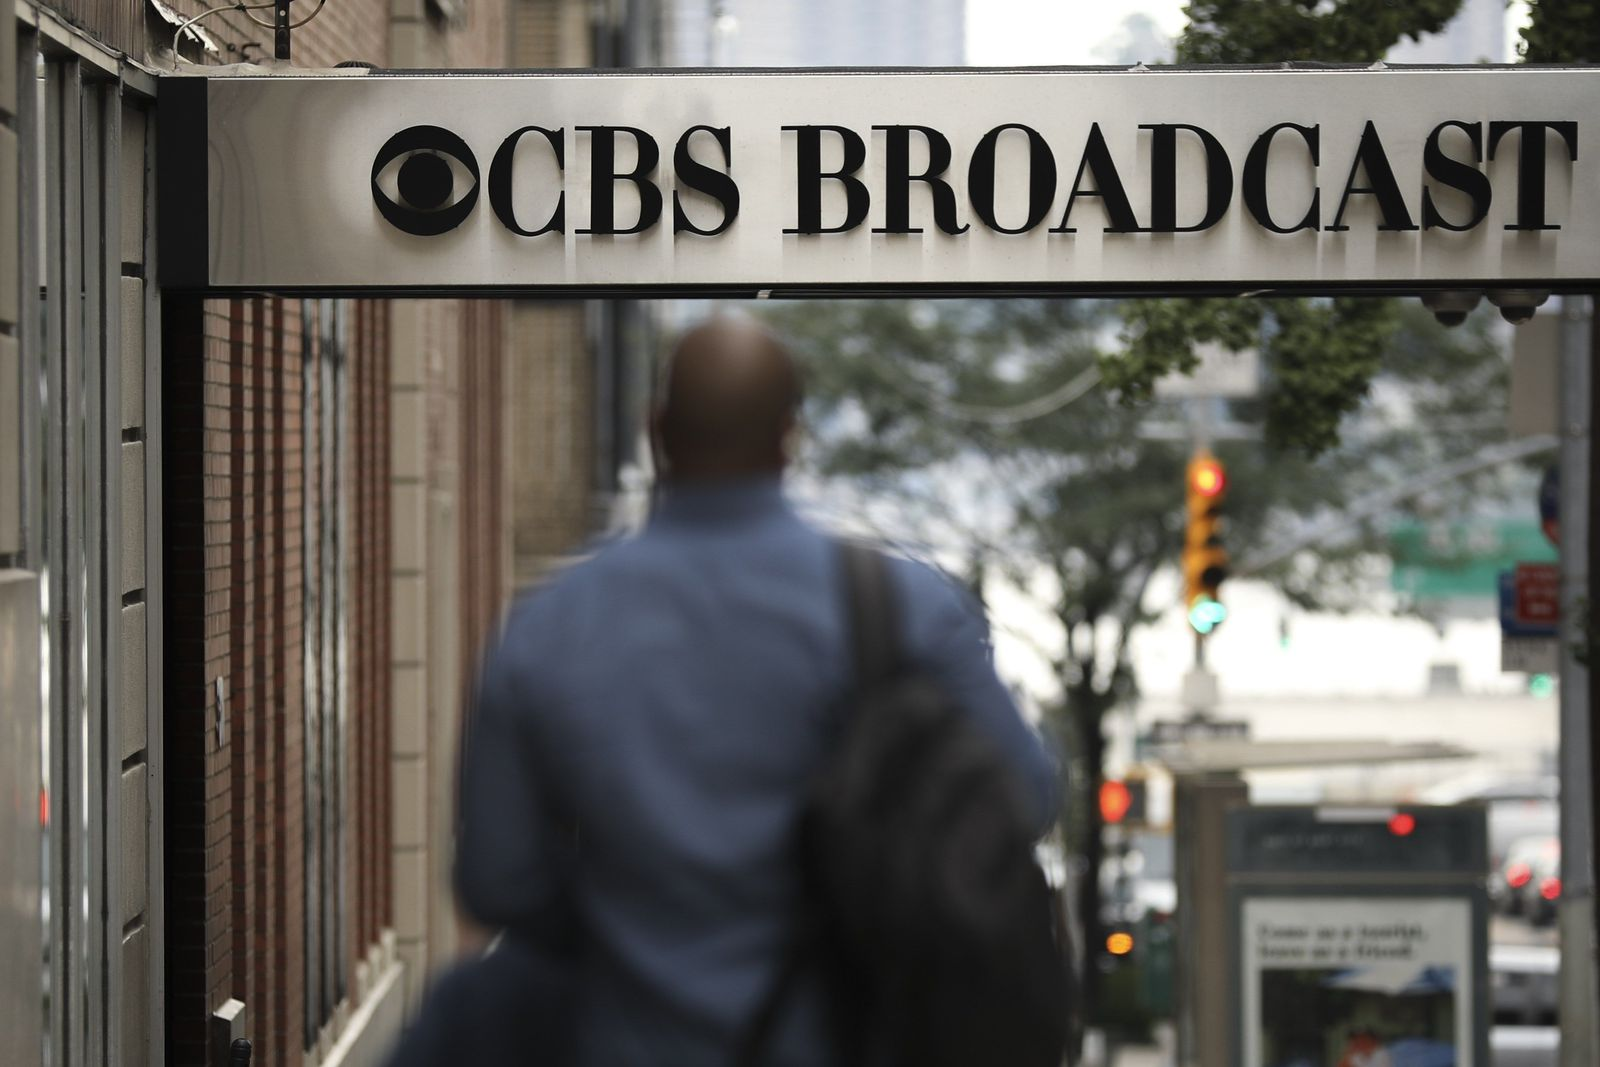 CBS und Viacom